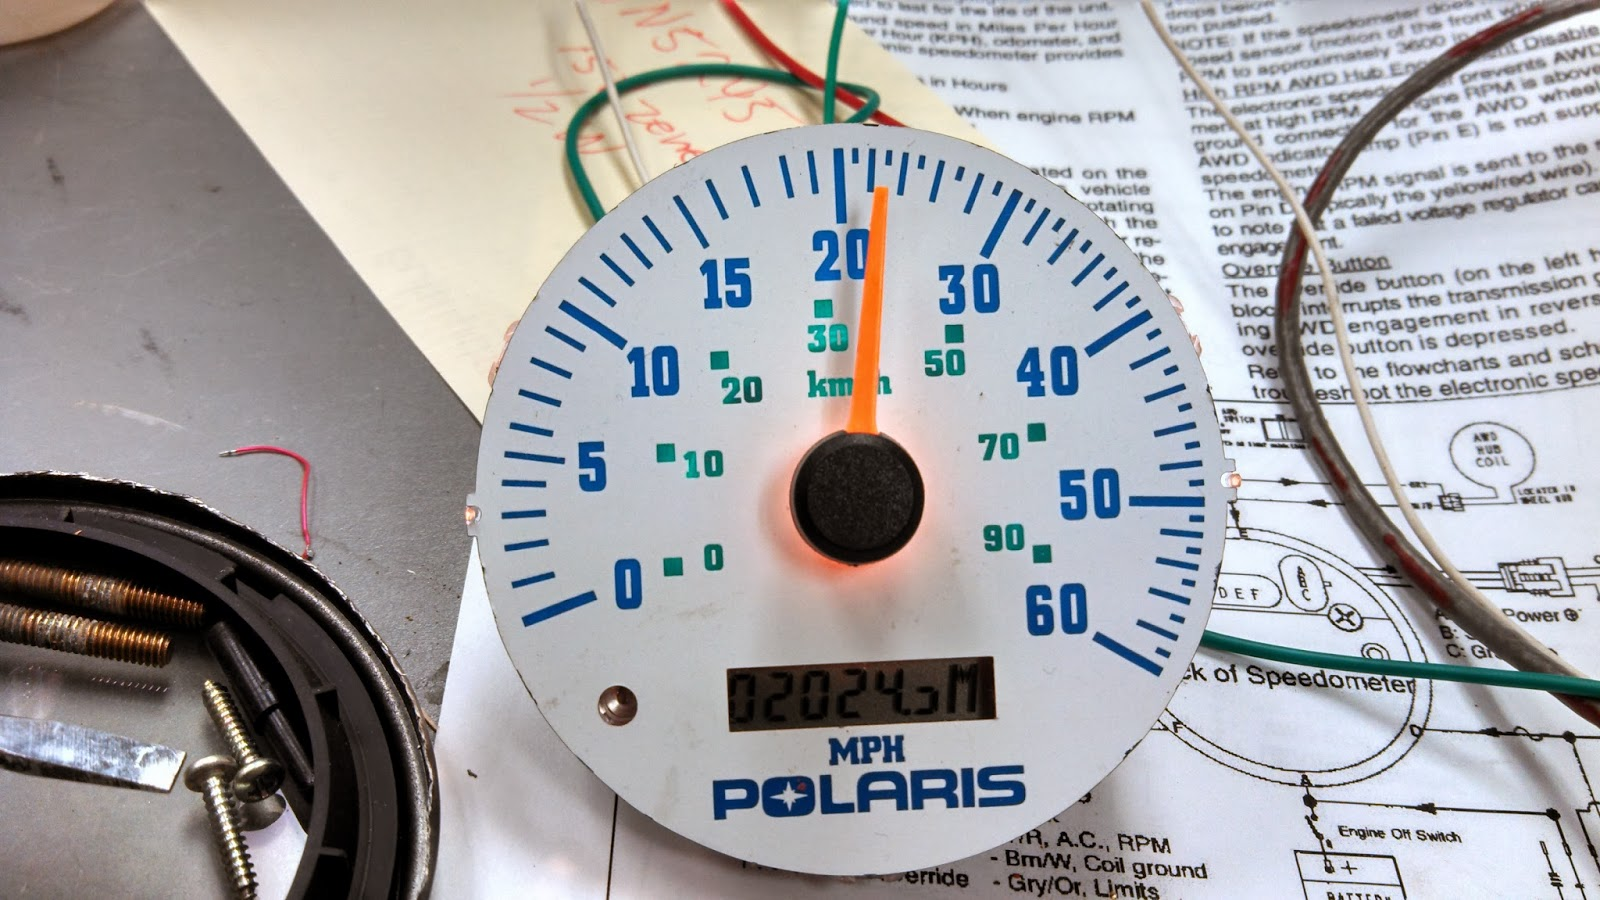 2001 polaris sportsman 500 awd wiring diagram [ 1600 x 900 Pixel ]